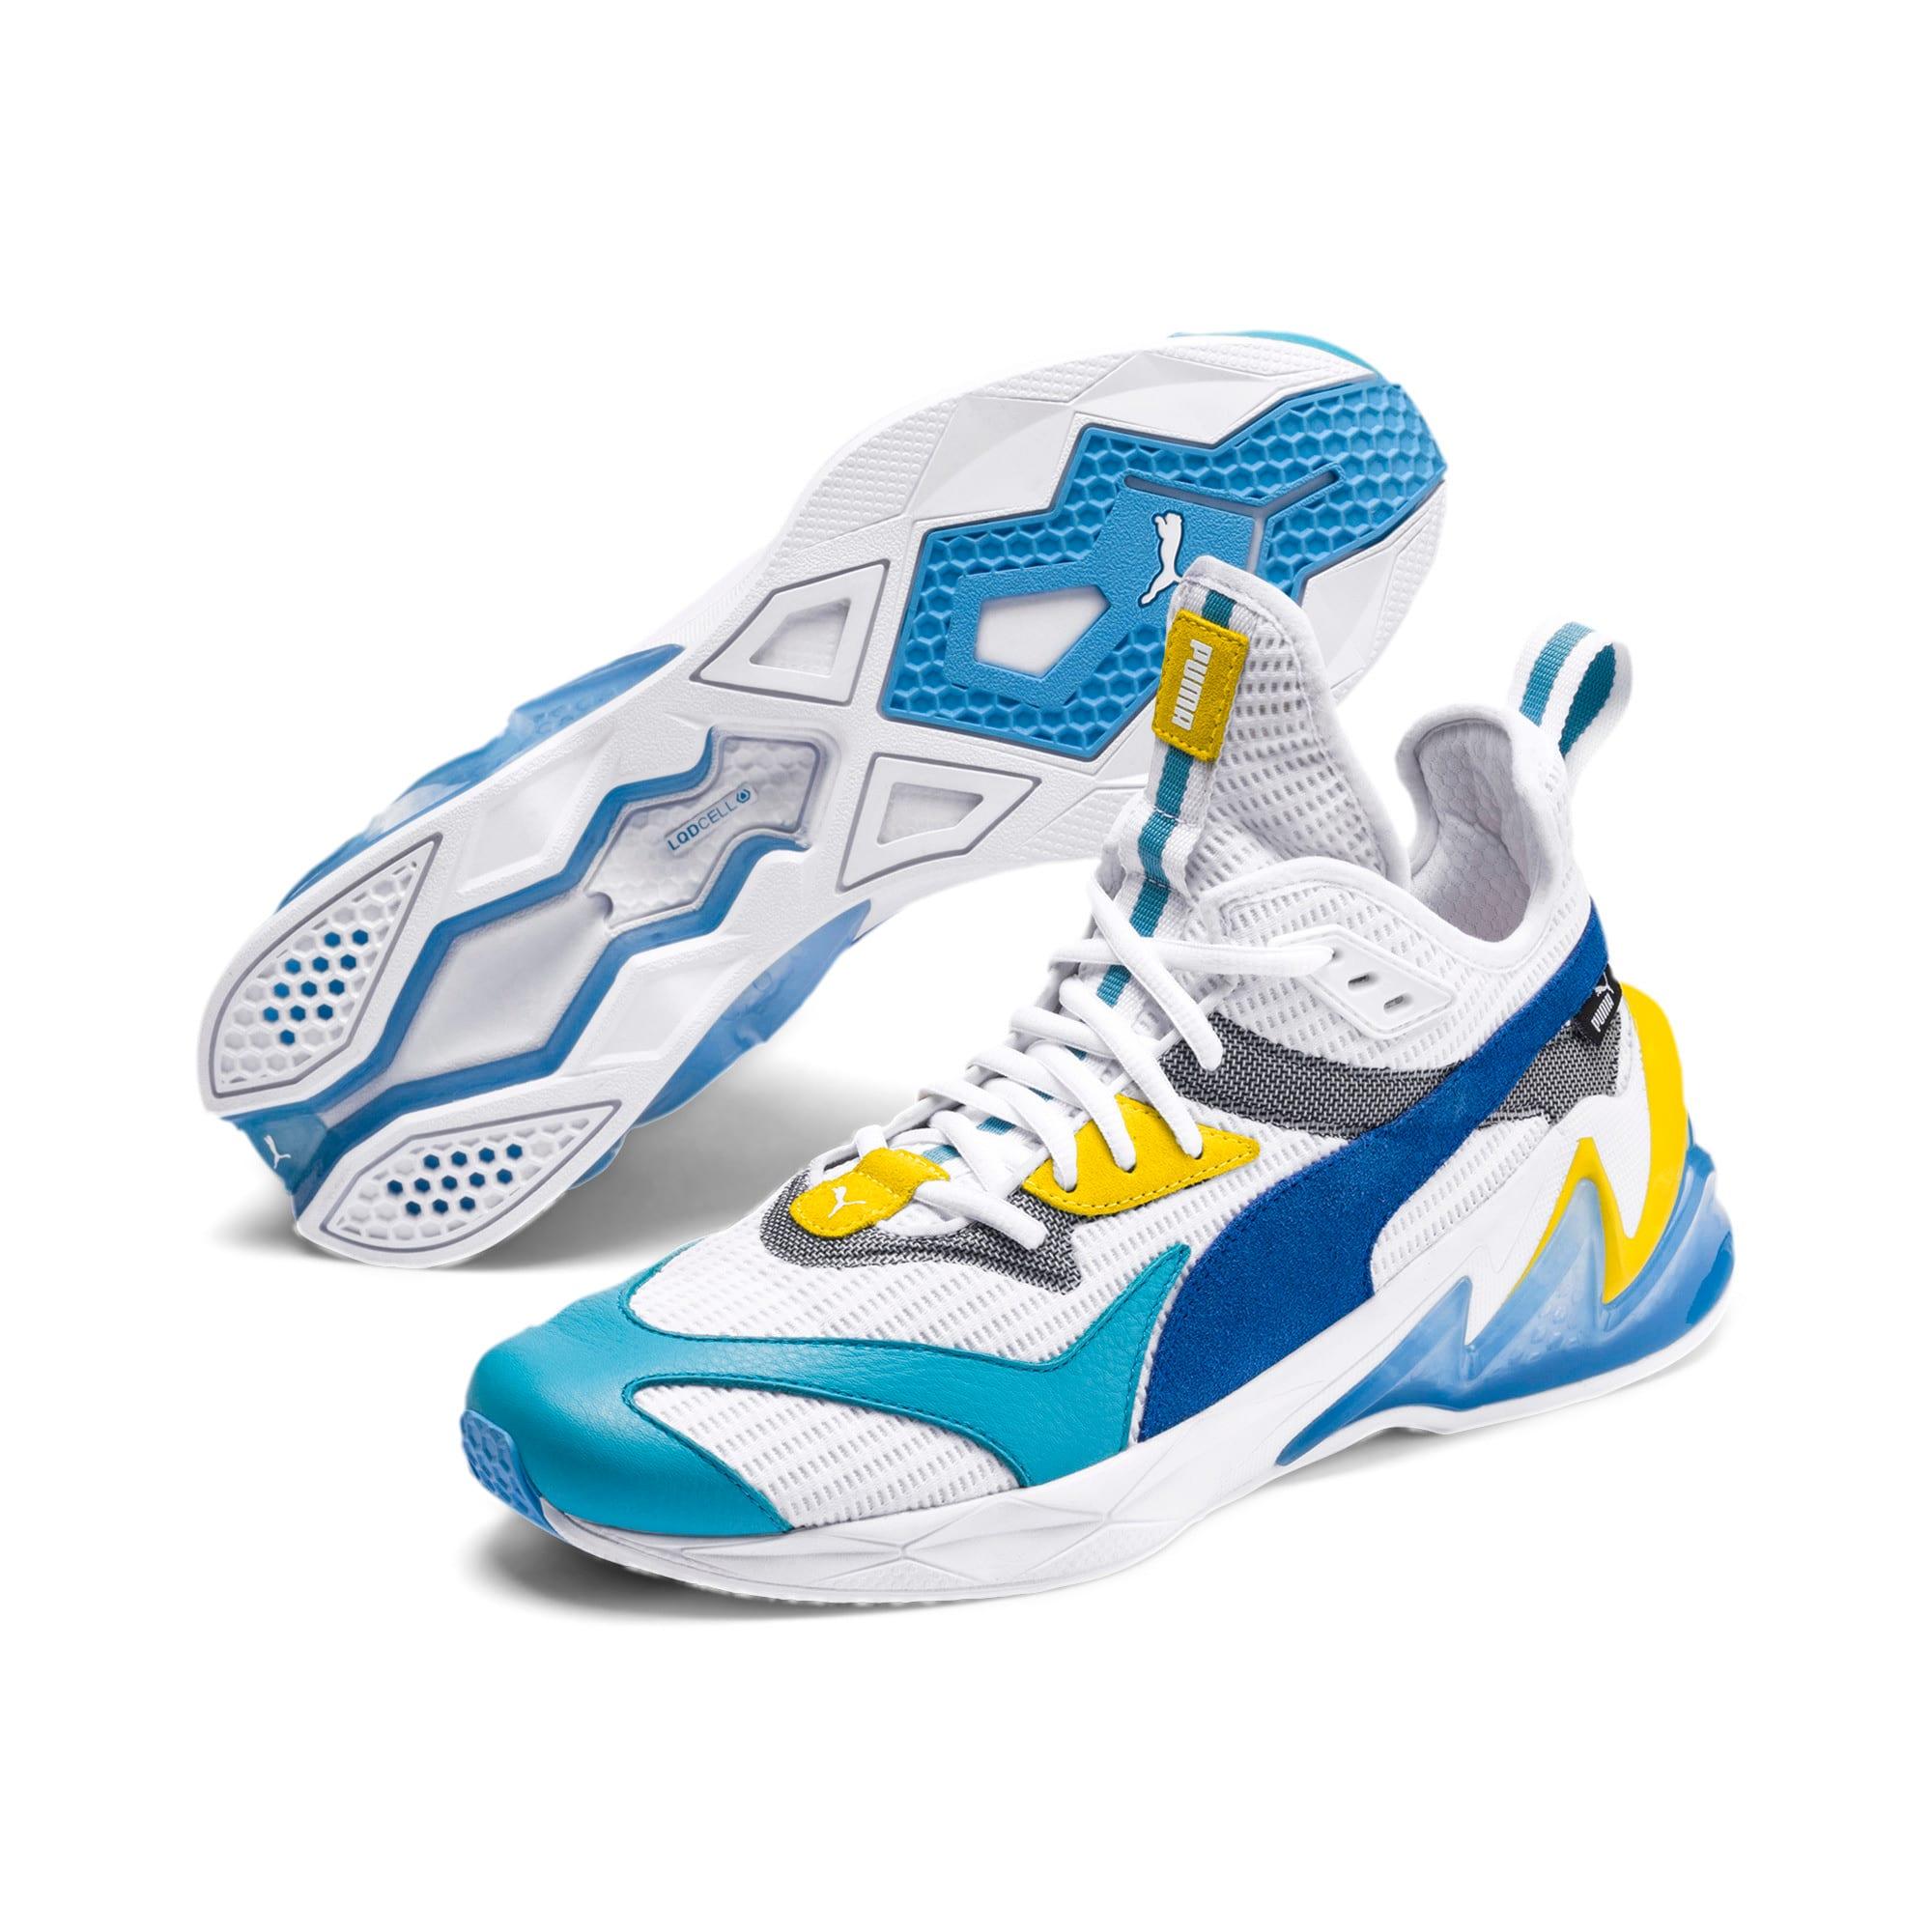 Thumbnail 2 of LQDCELL Origin Men's Shoes, Puma White-B Blue-Blz Yellow, medium